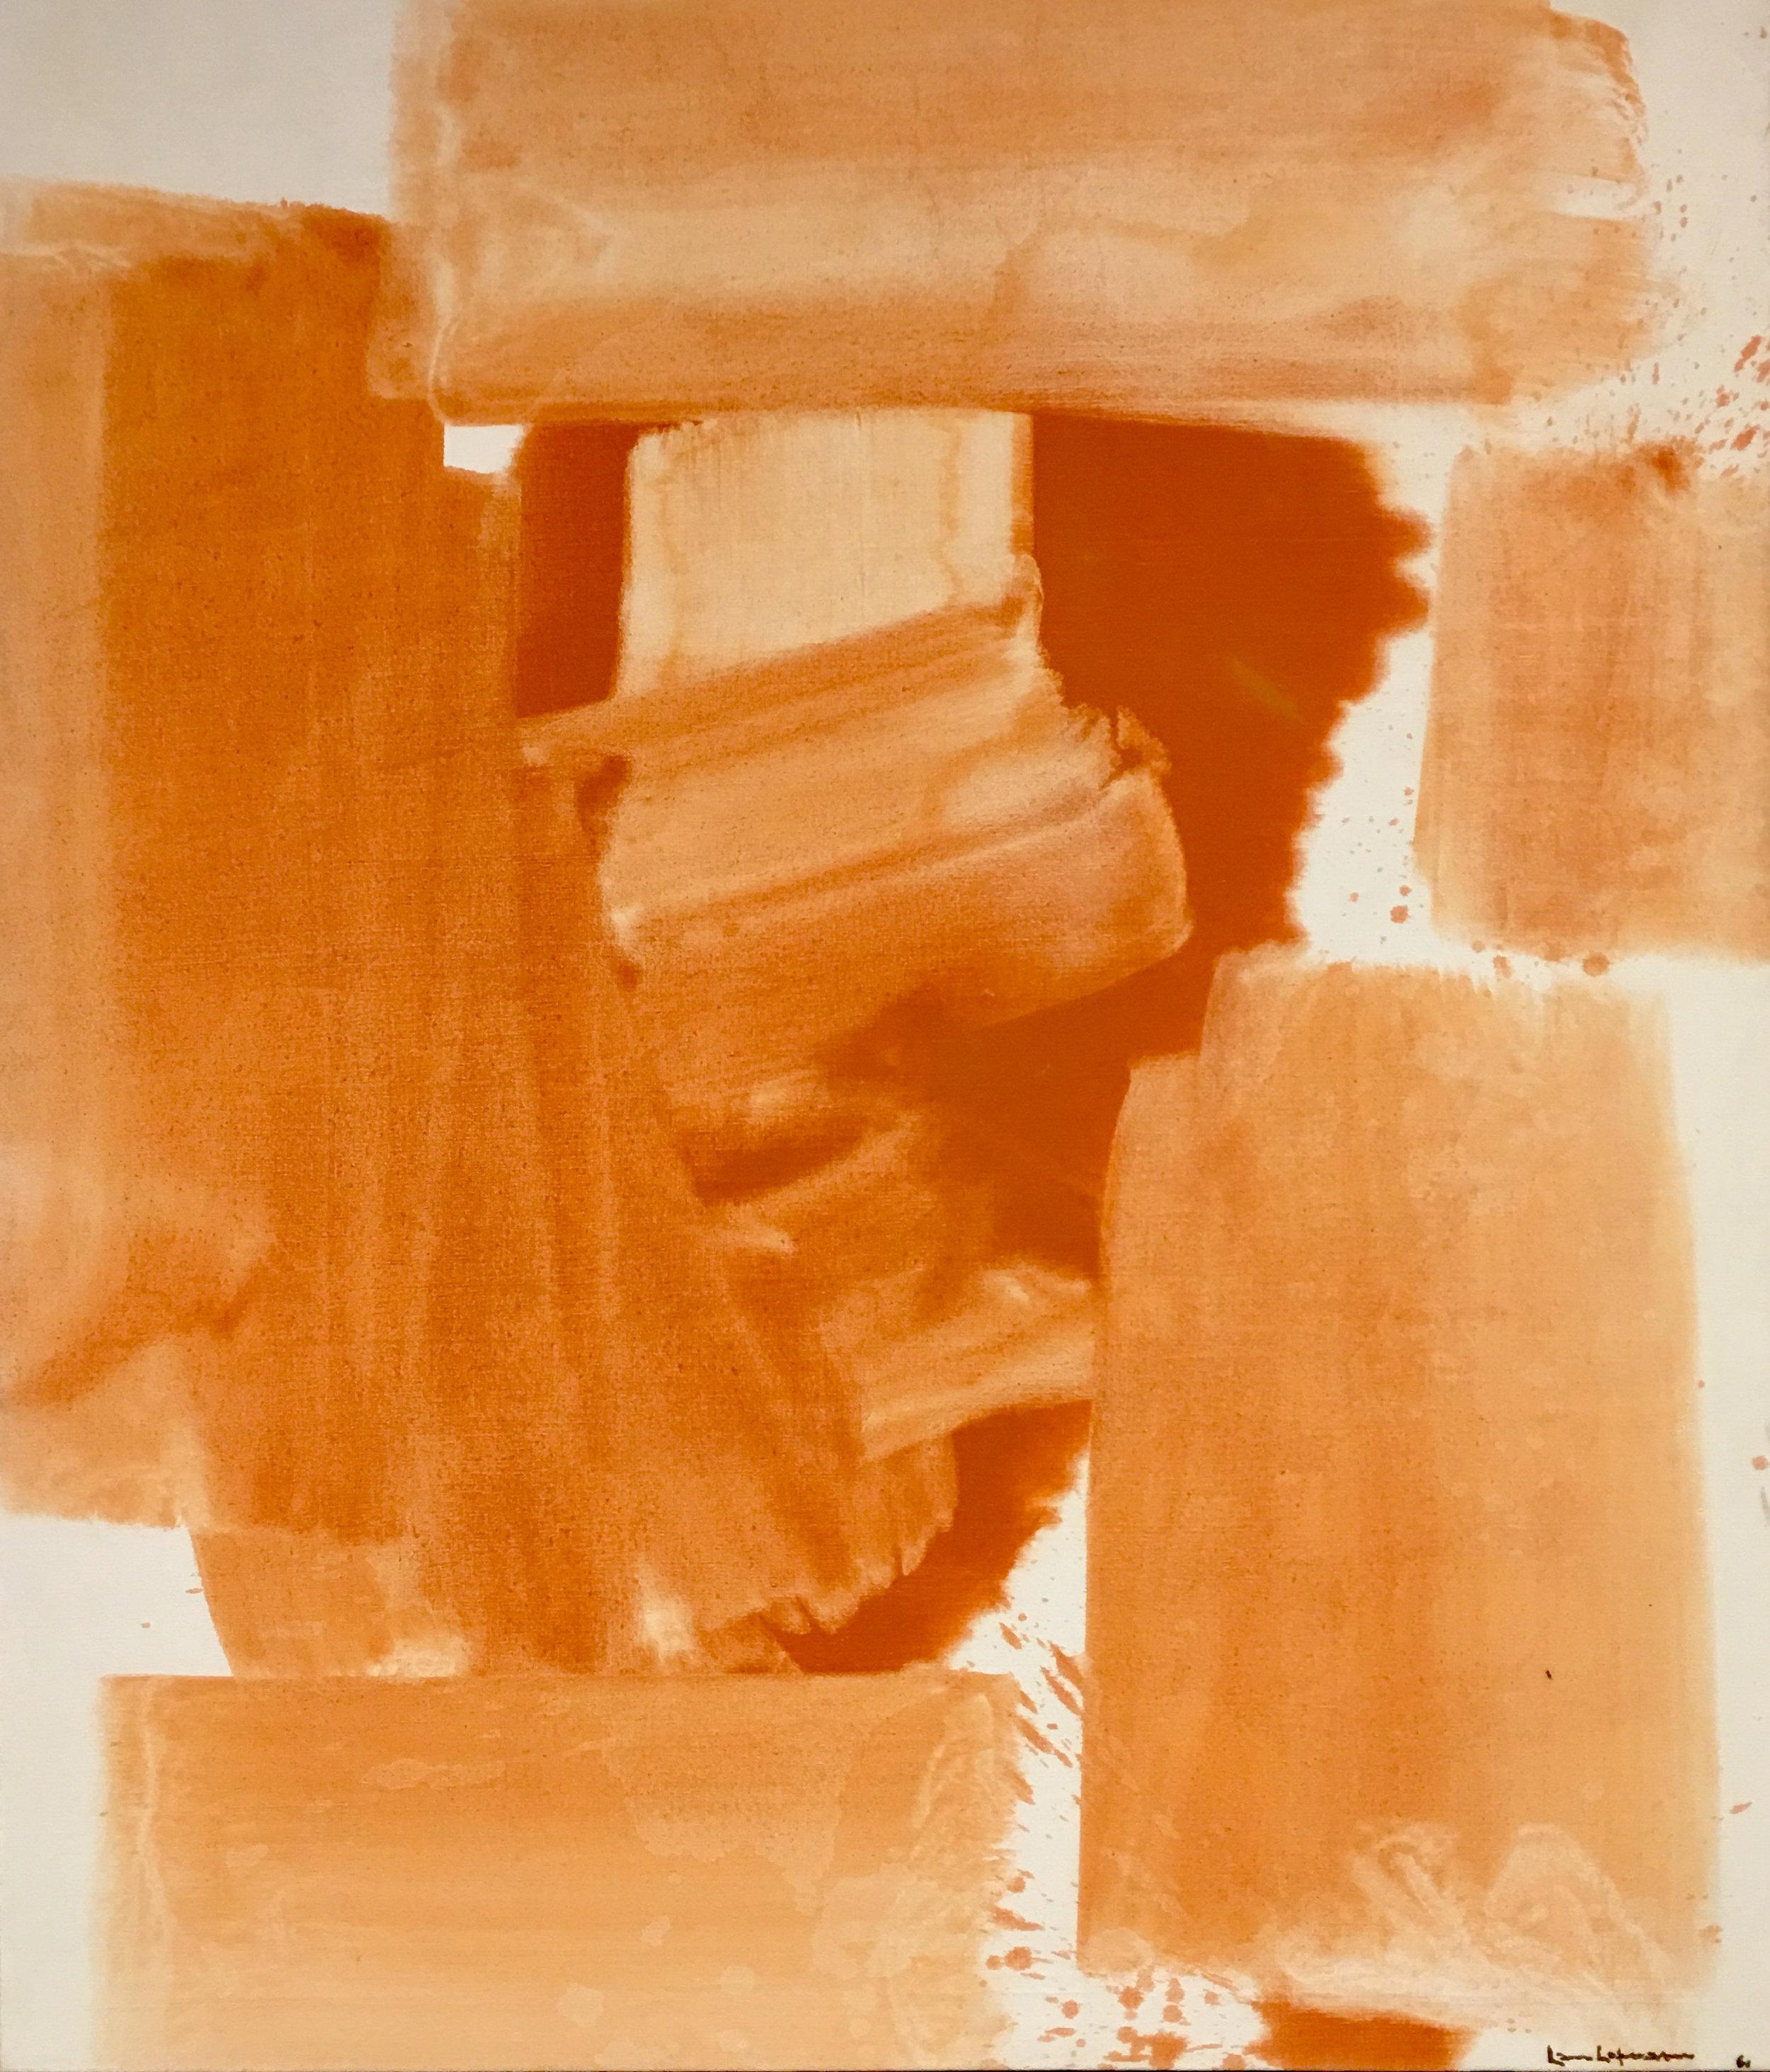 Agrigento, oil on canvas, 1961, Hans Hoffman, (photograph J. Cook)